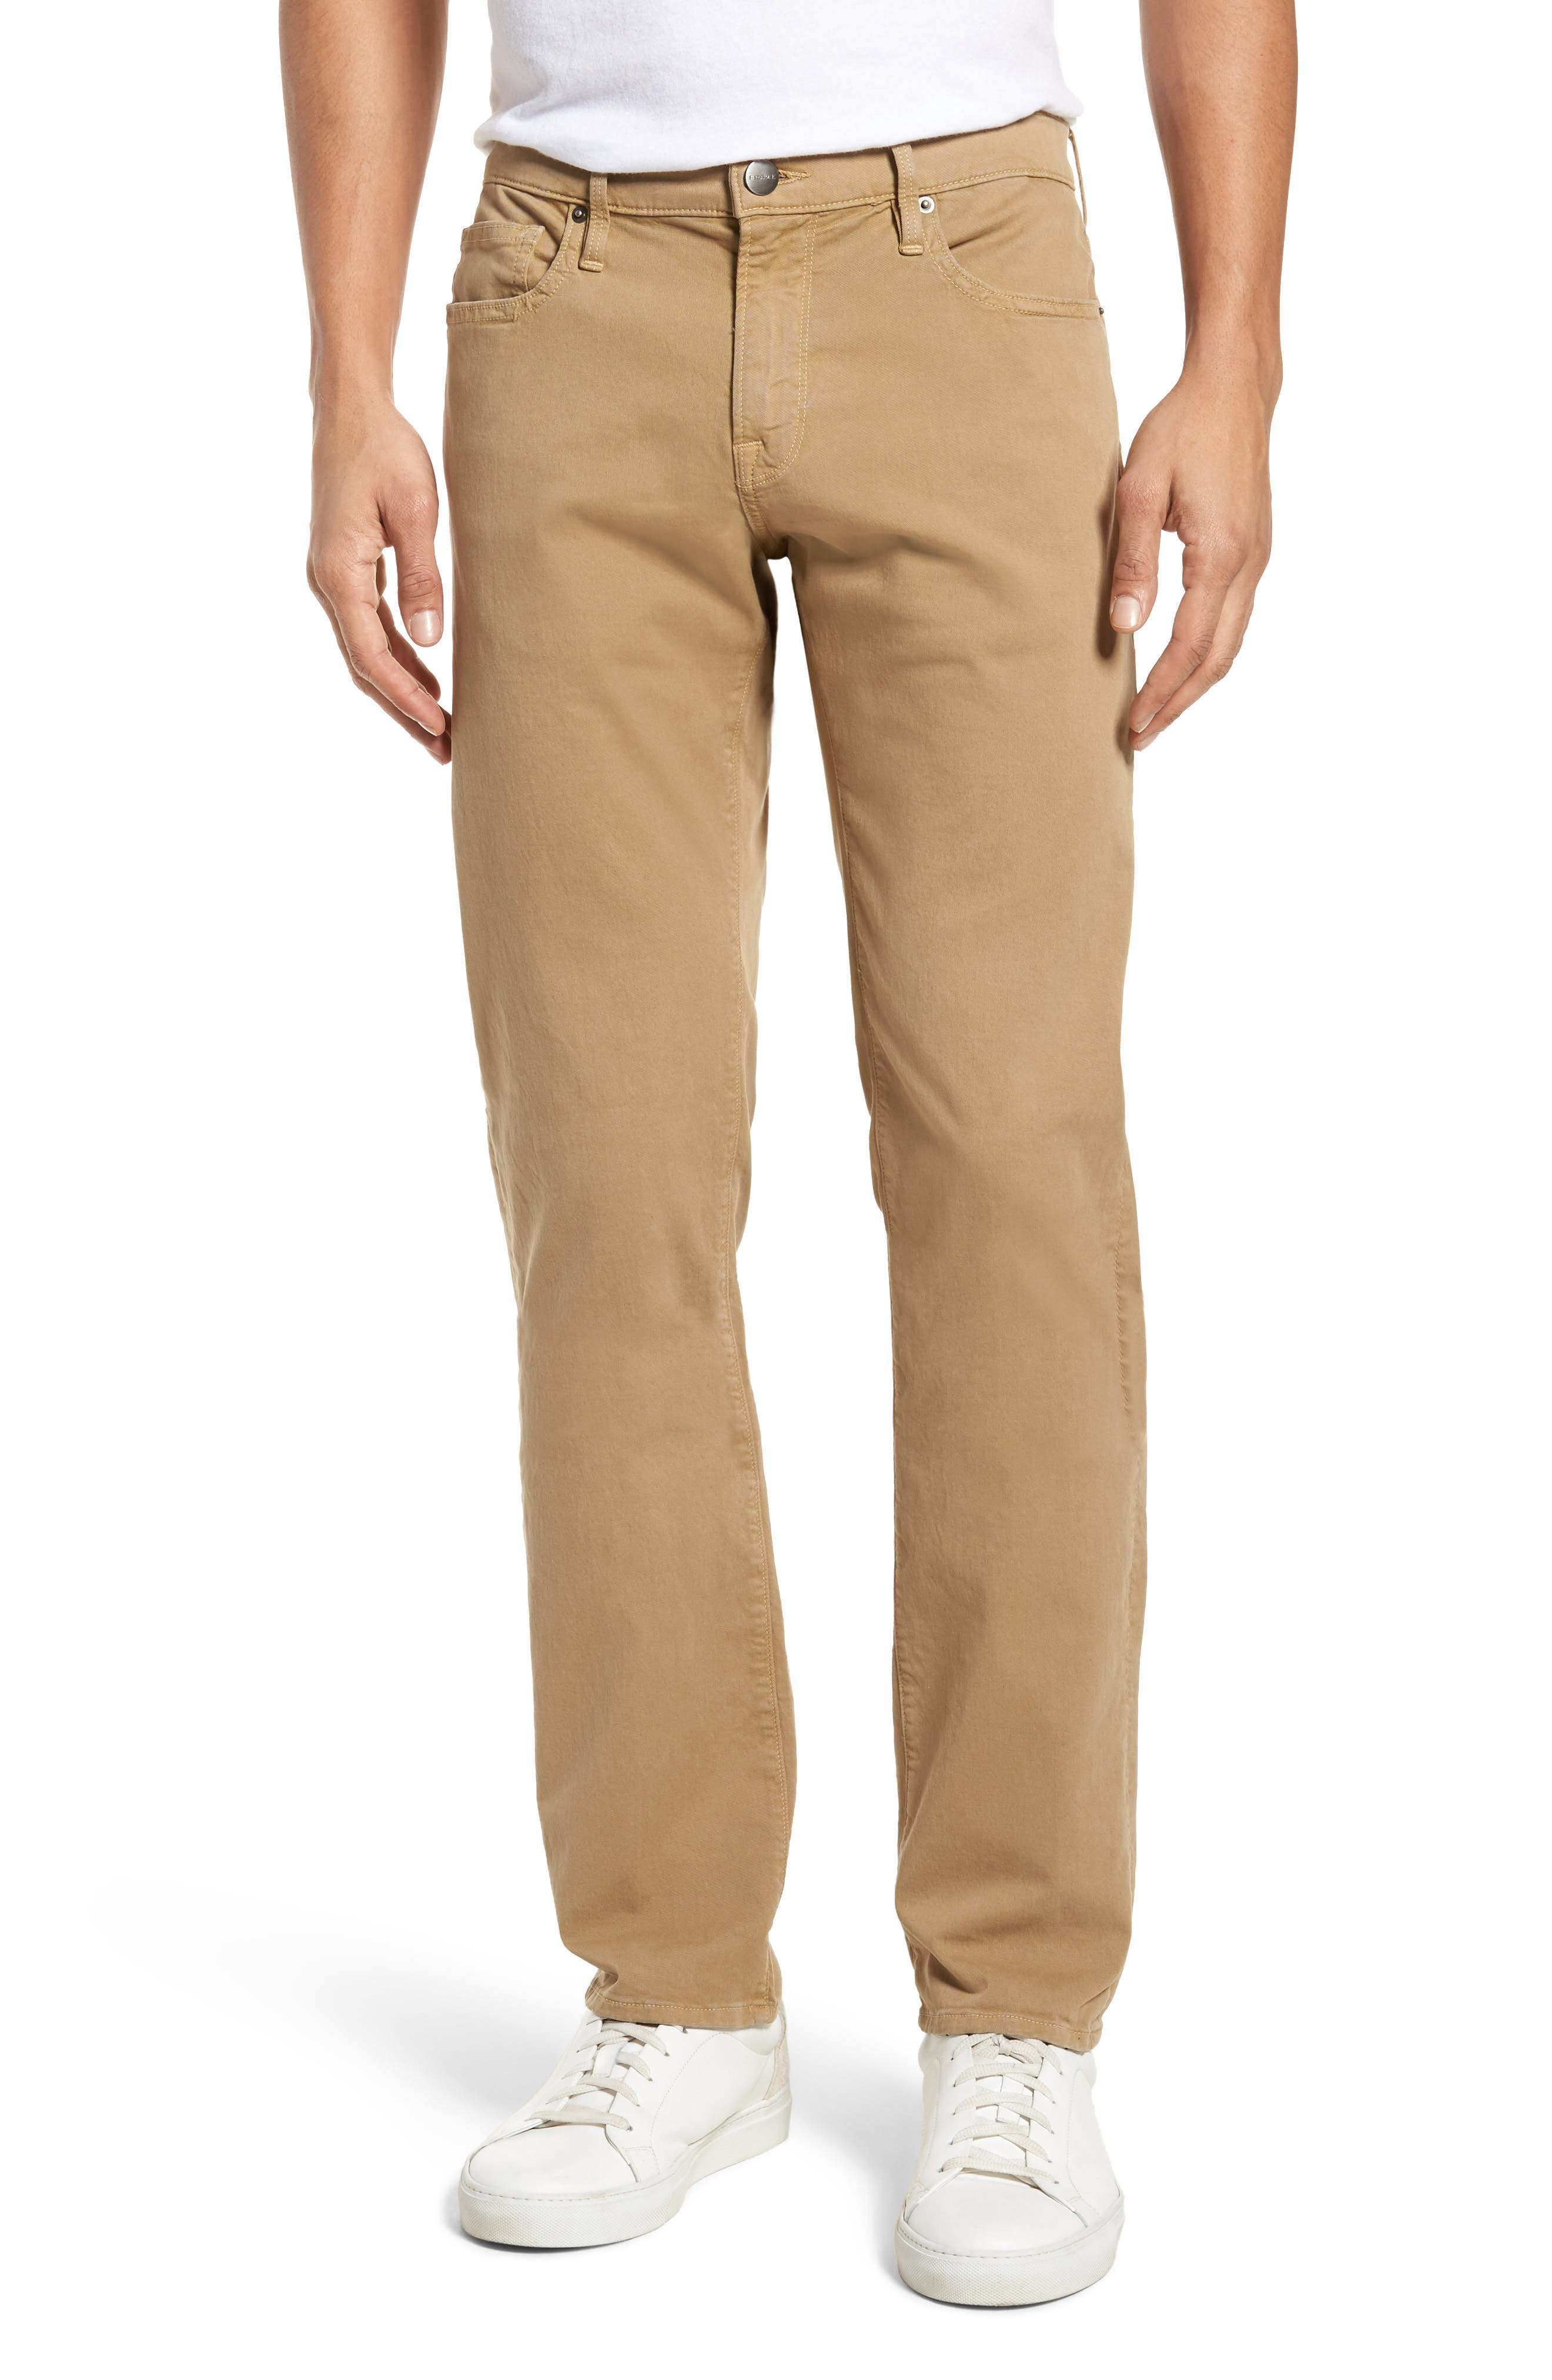 Homme Slim Fit Chino Pants,                         Main,                         color, Khaki